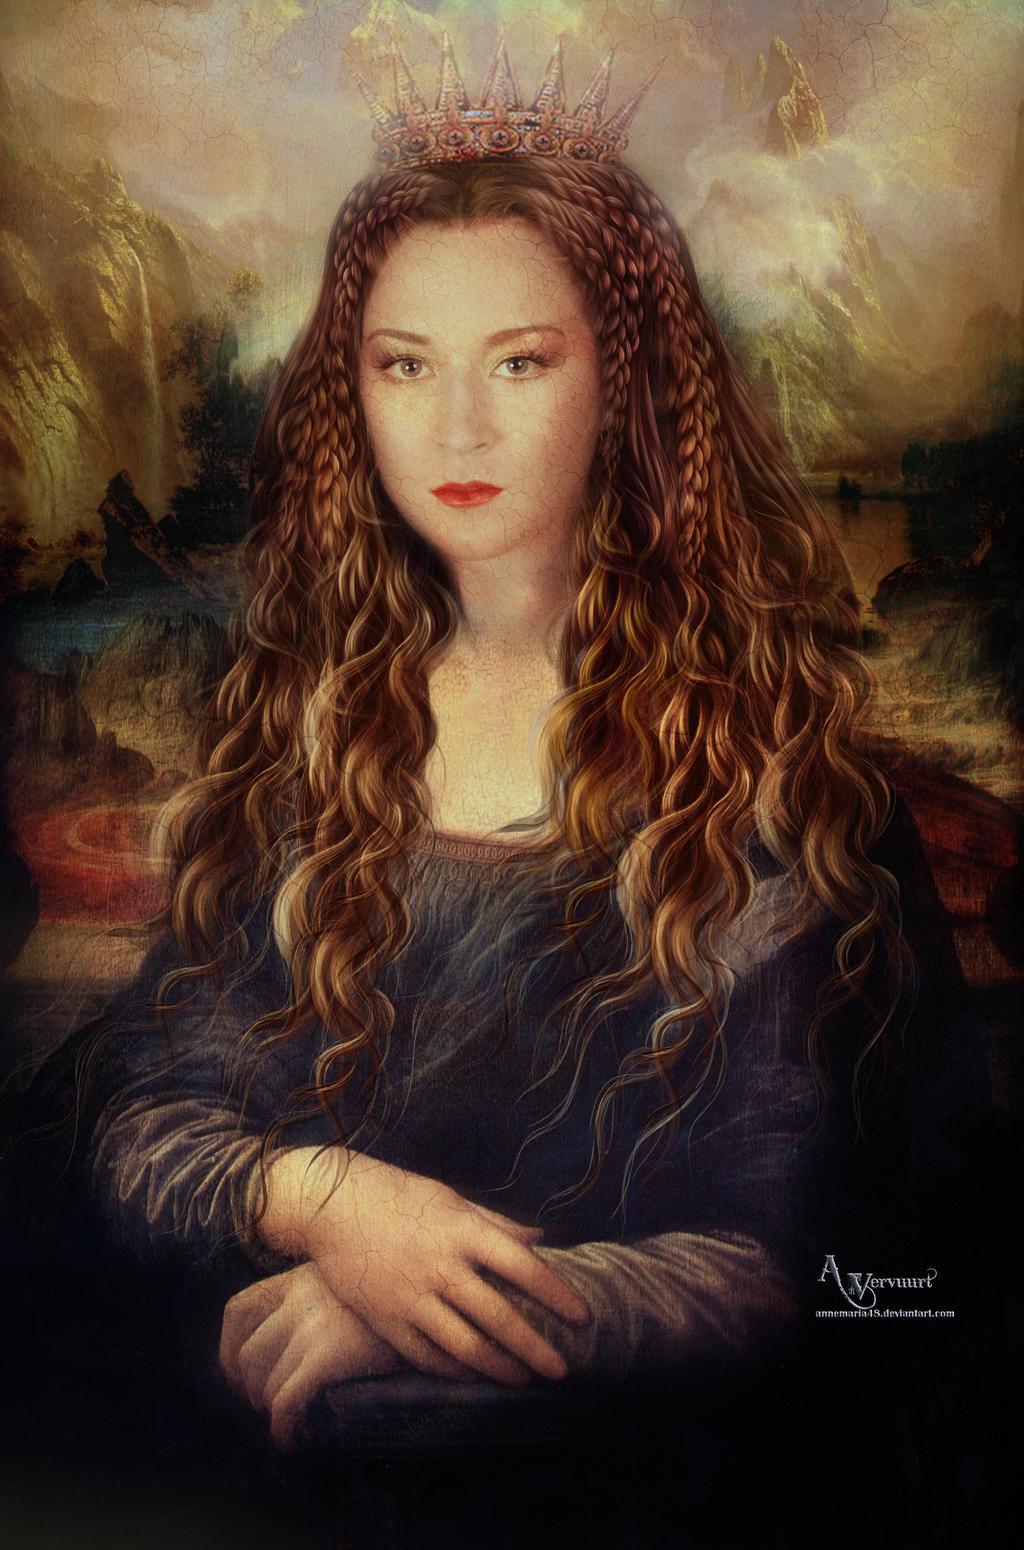 Mona-lisa-67506